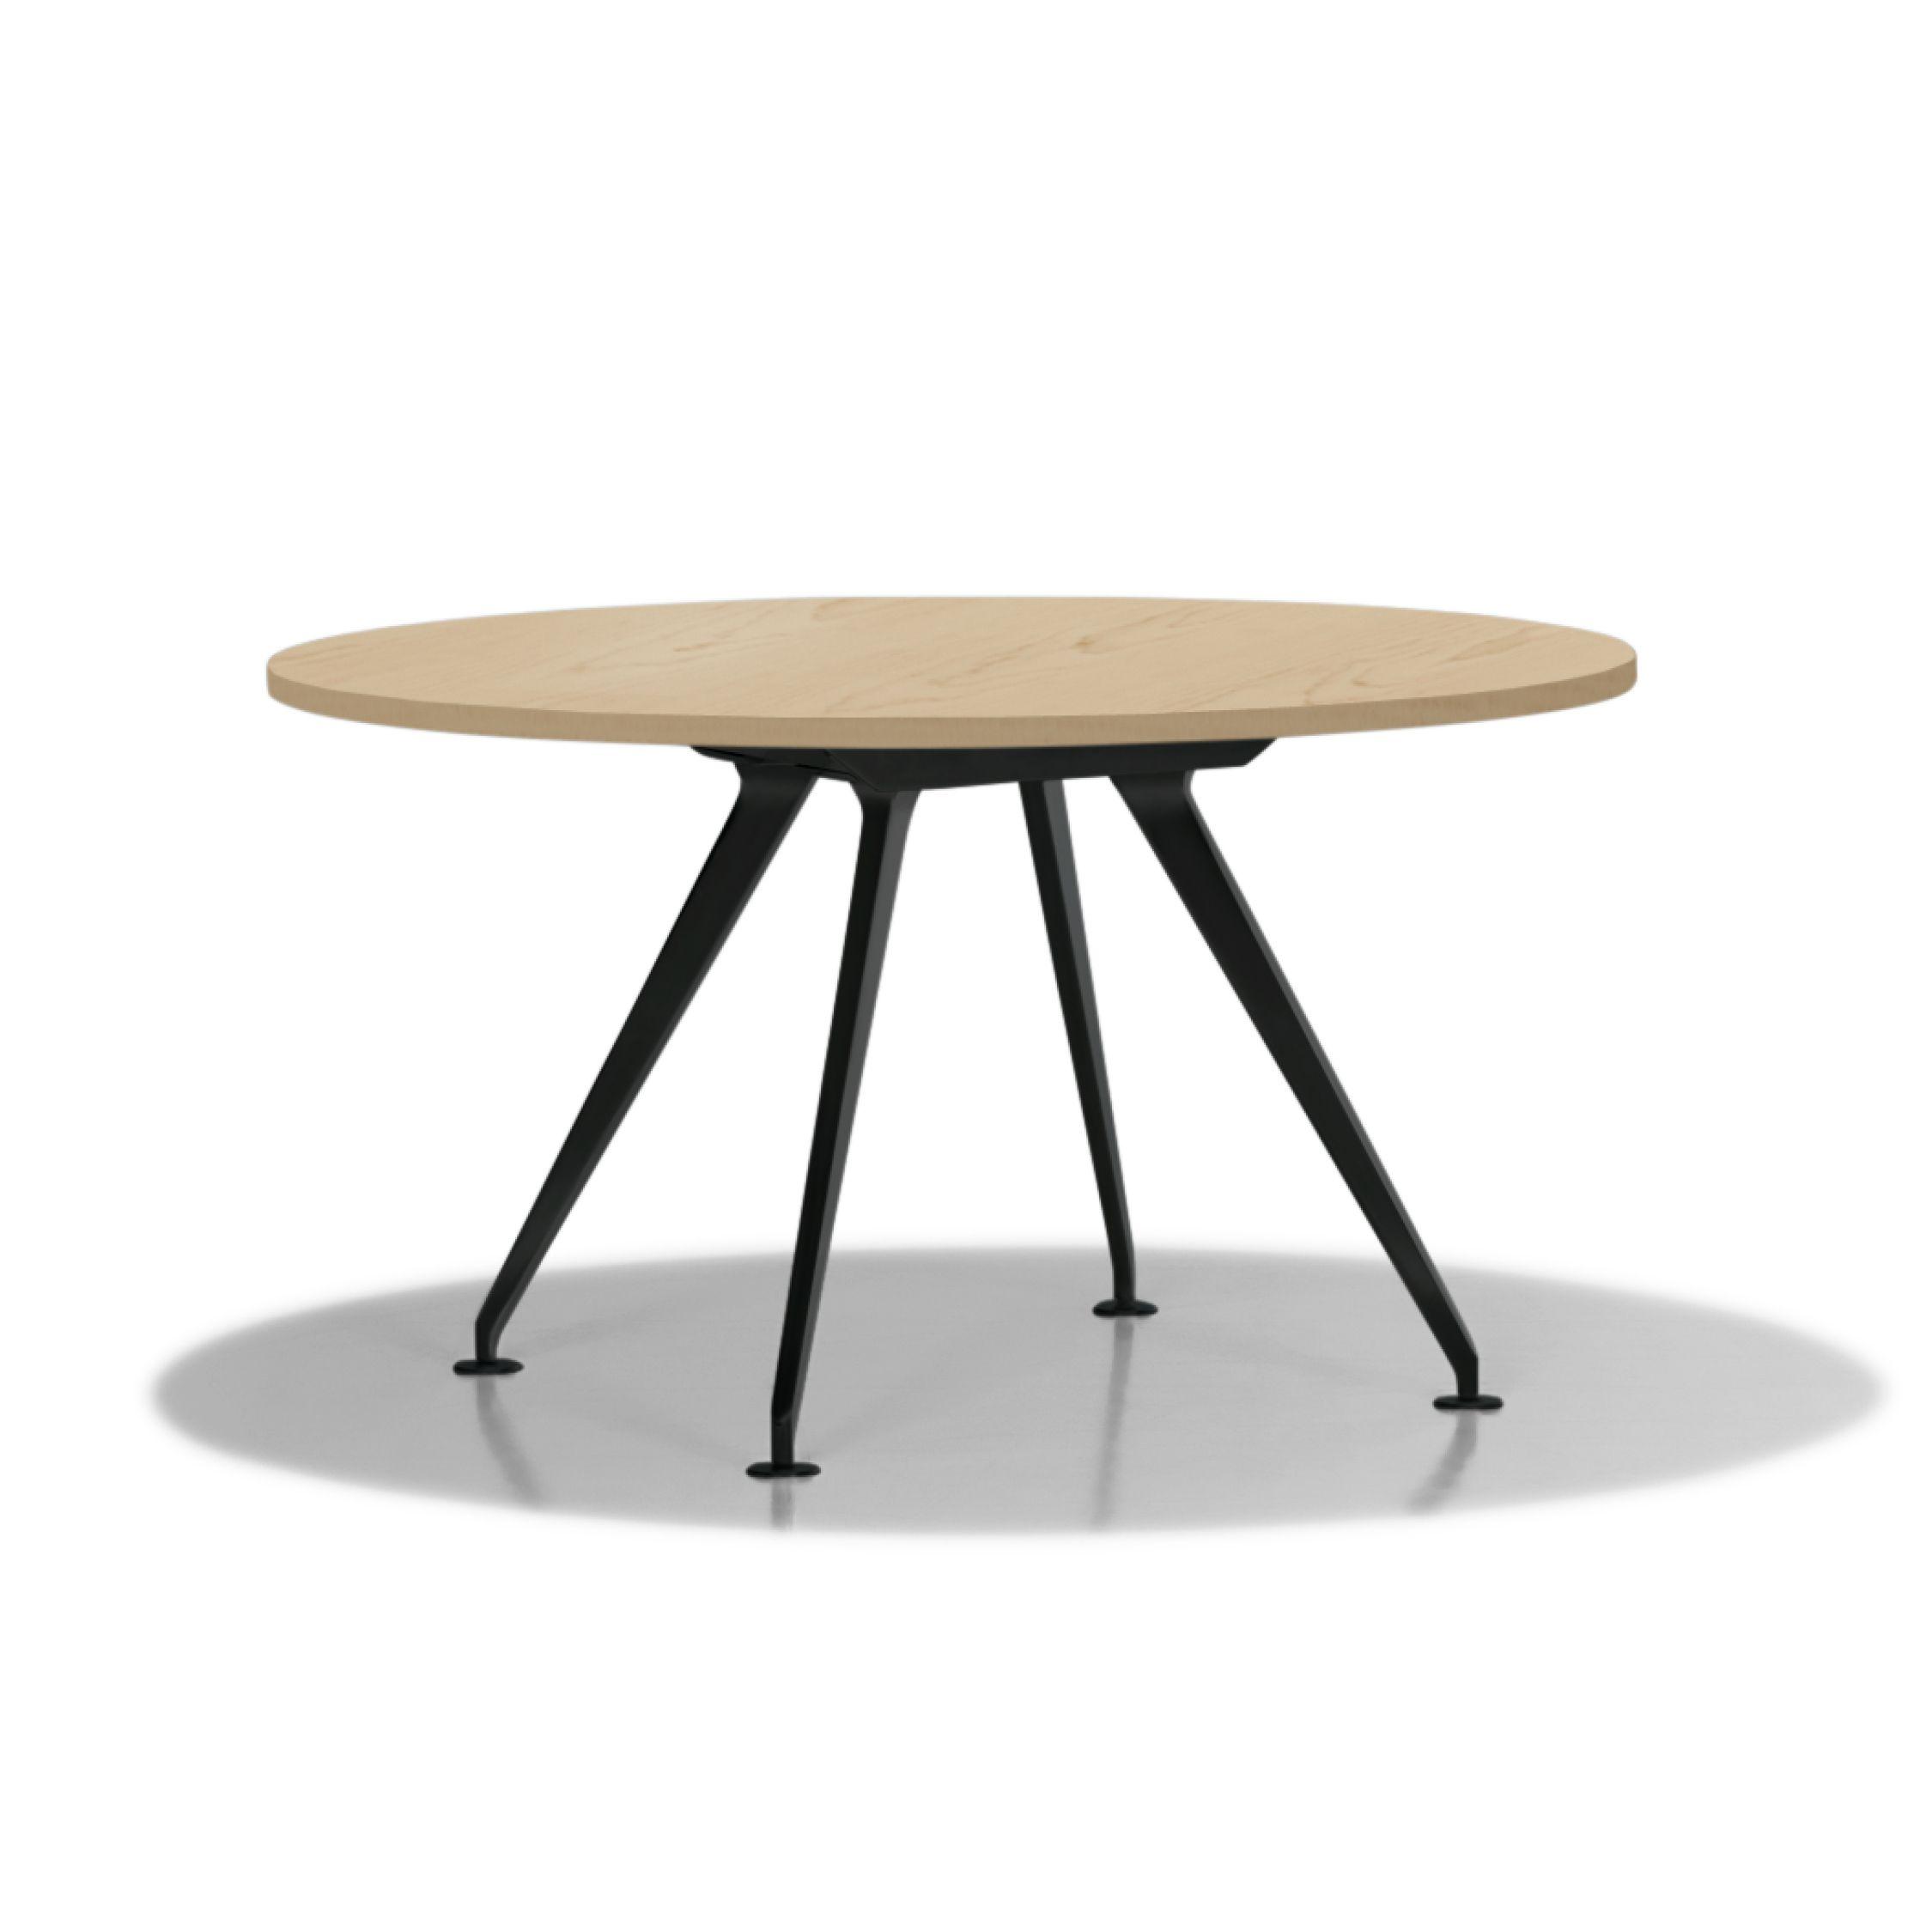 Parallax Table Richard Holbrook For Bernhardt Design Bernhardt Design Table [ 2250 x 2250 Pixel ]